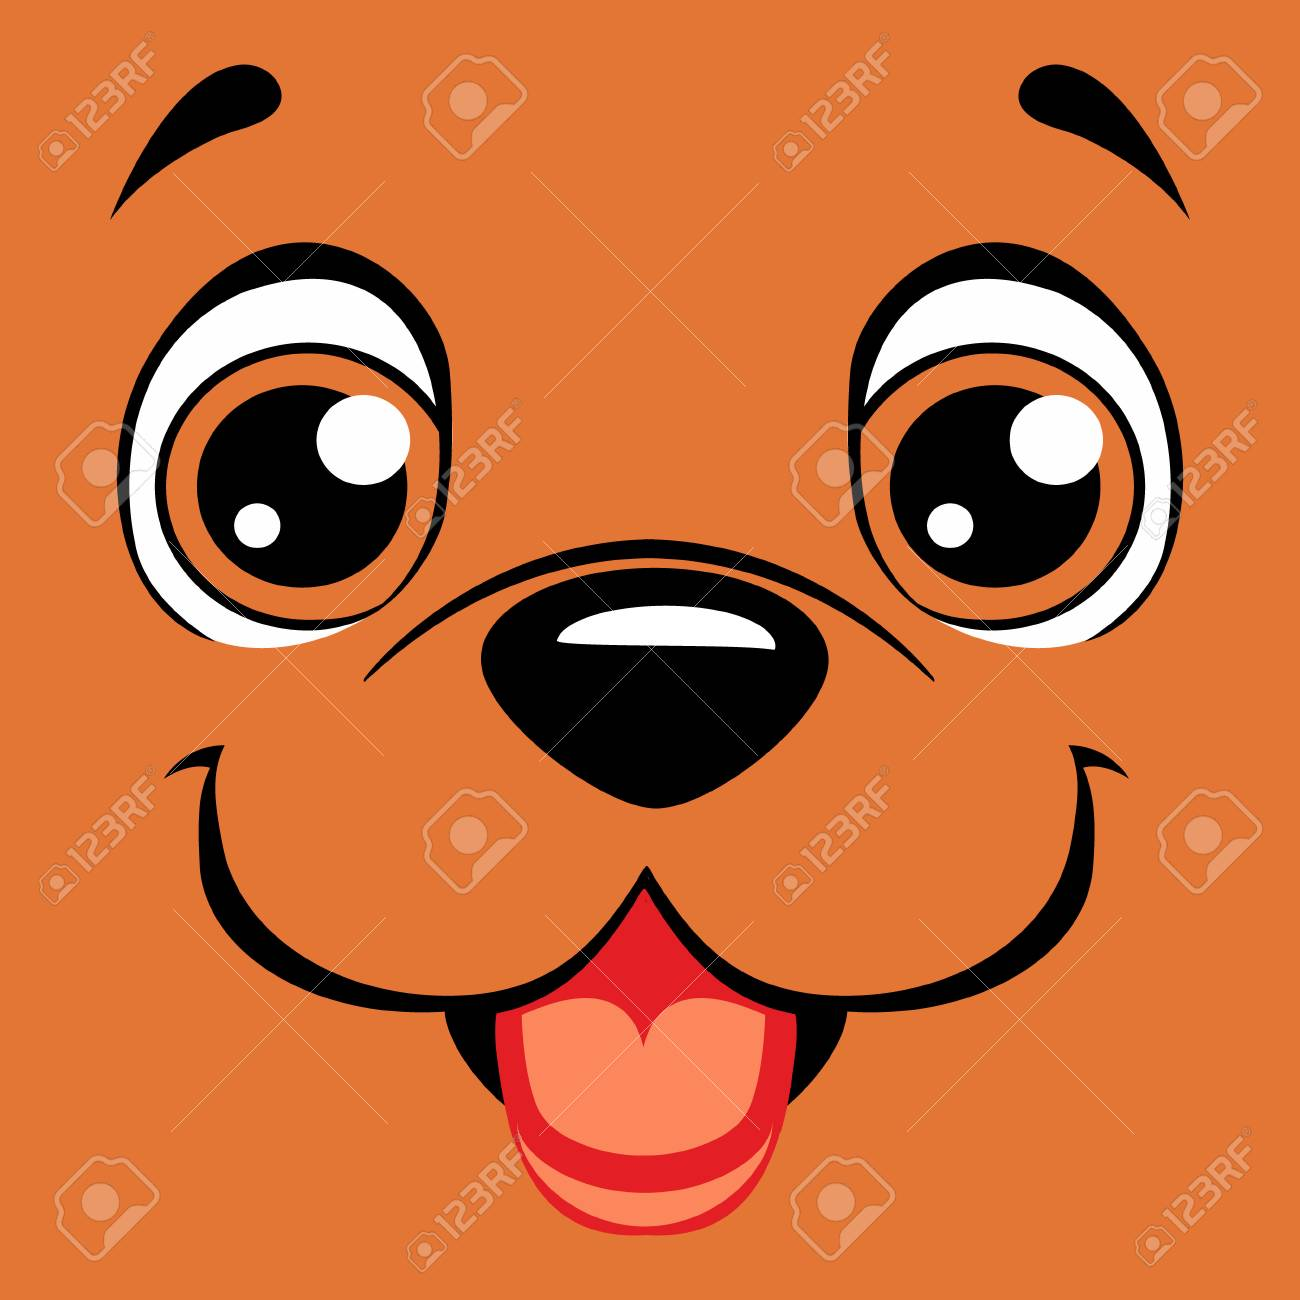 Cartoon Face Happy Dog Royalty Free Cliparts Vectors And Stock Illustration Image 87685871